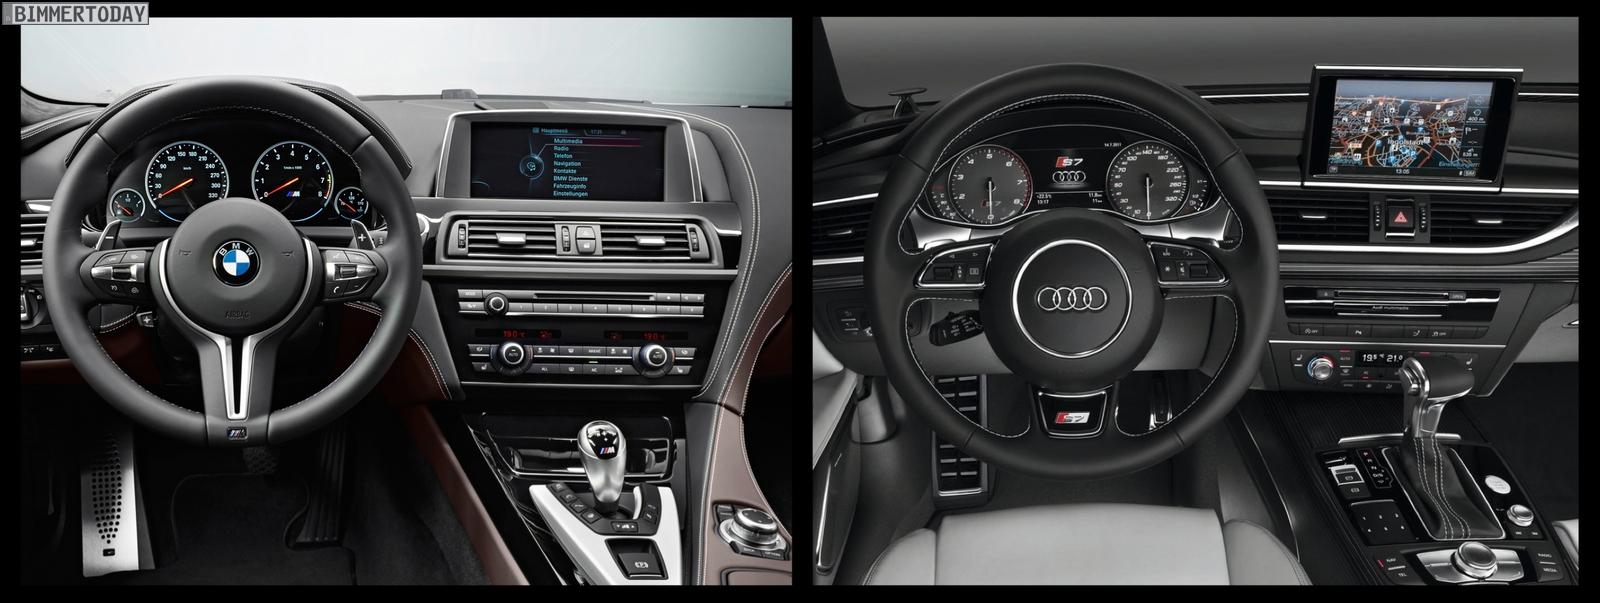 Bild Vergleich BMW M6 Gran Coupé Audi S7 Sportback 06